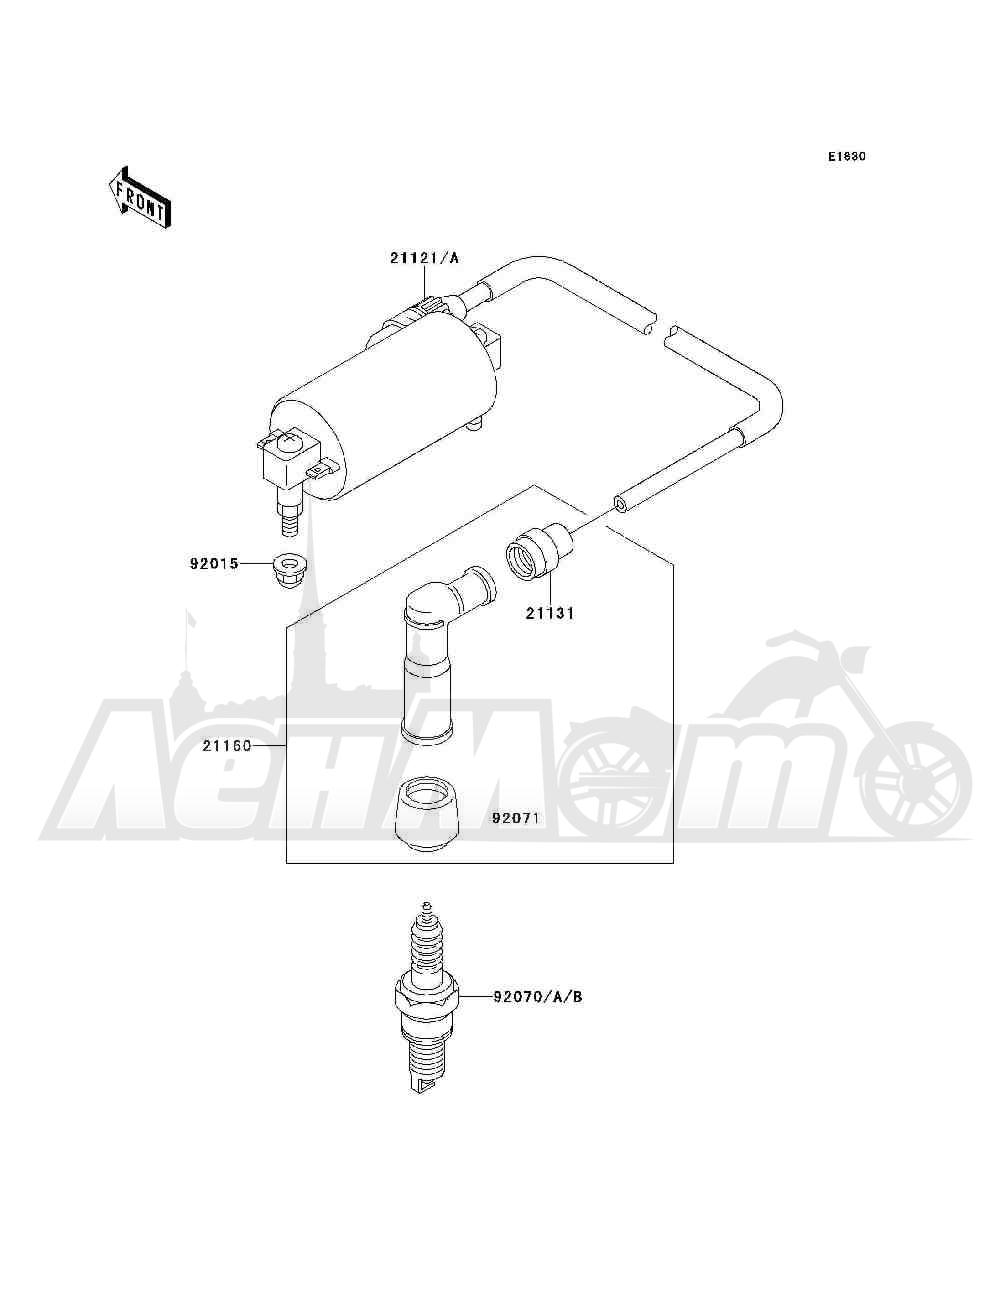 Запчасти для Квадроцикла Kawasaki 1994 BAYOU 300 4X4 (KLF300-C6) Раздел: IGNITION SYSTEM | система зажигания